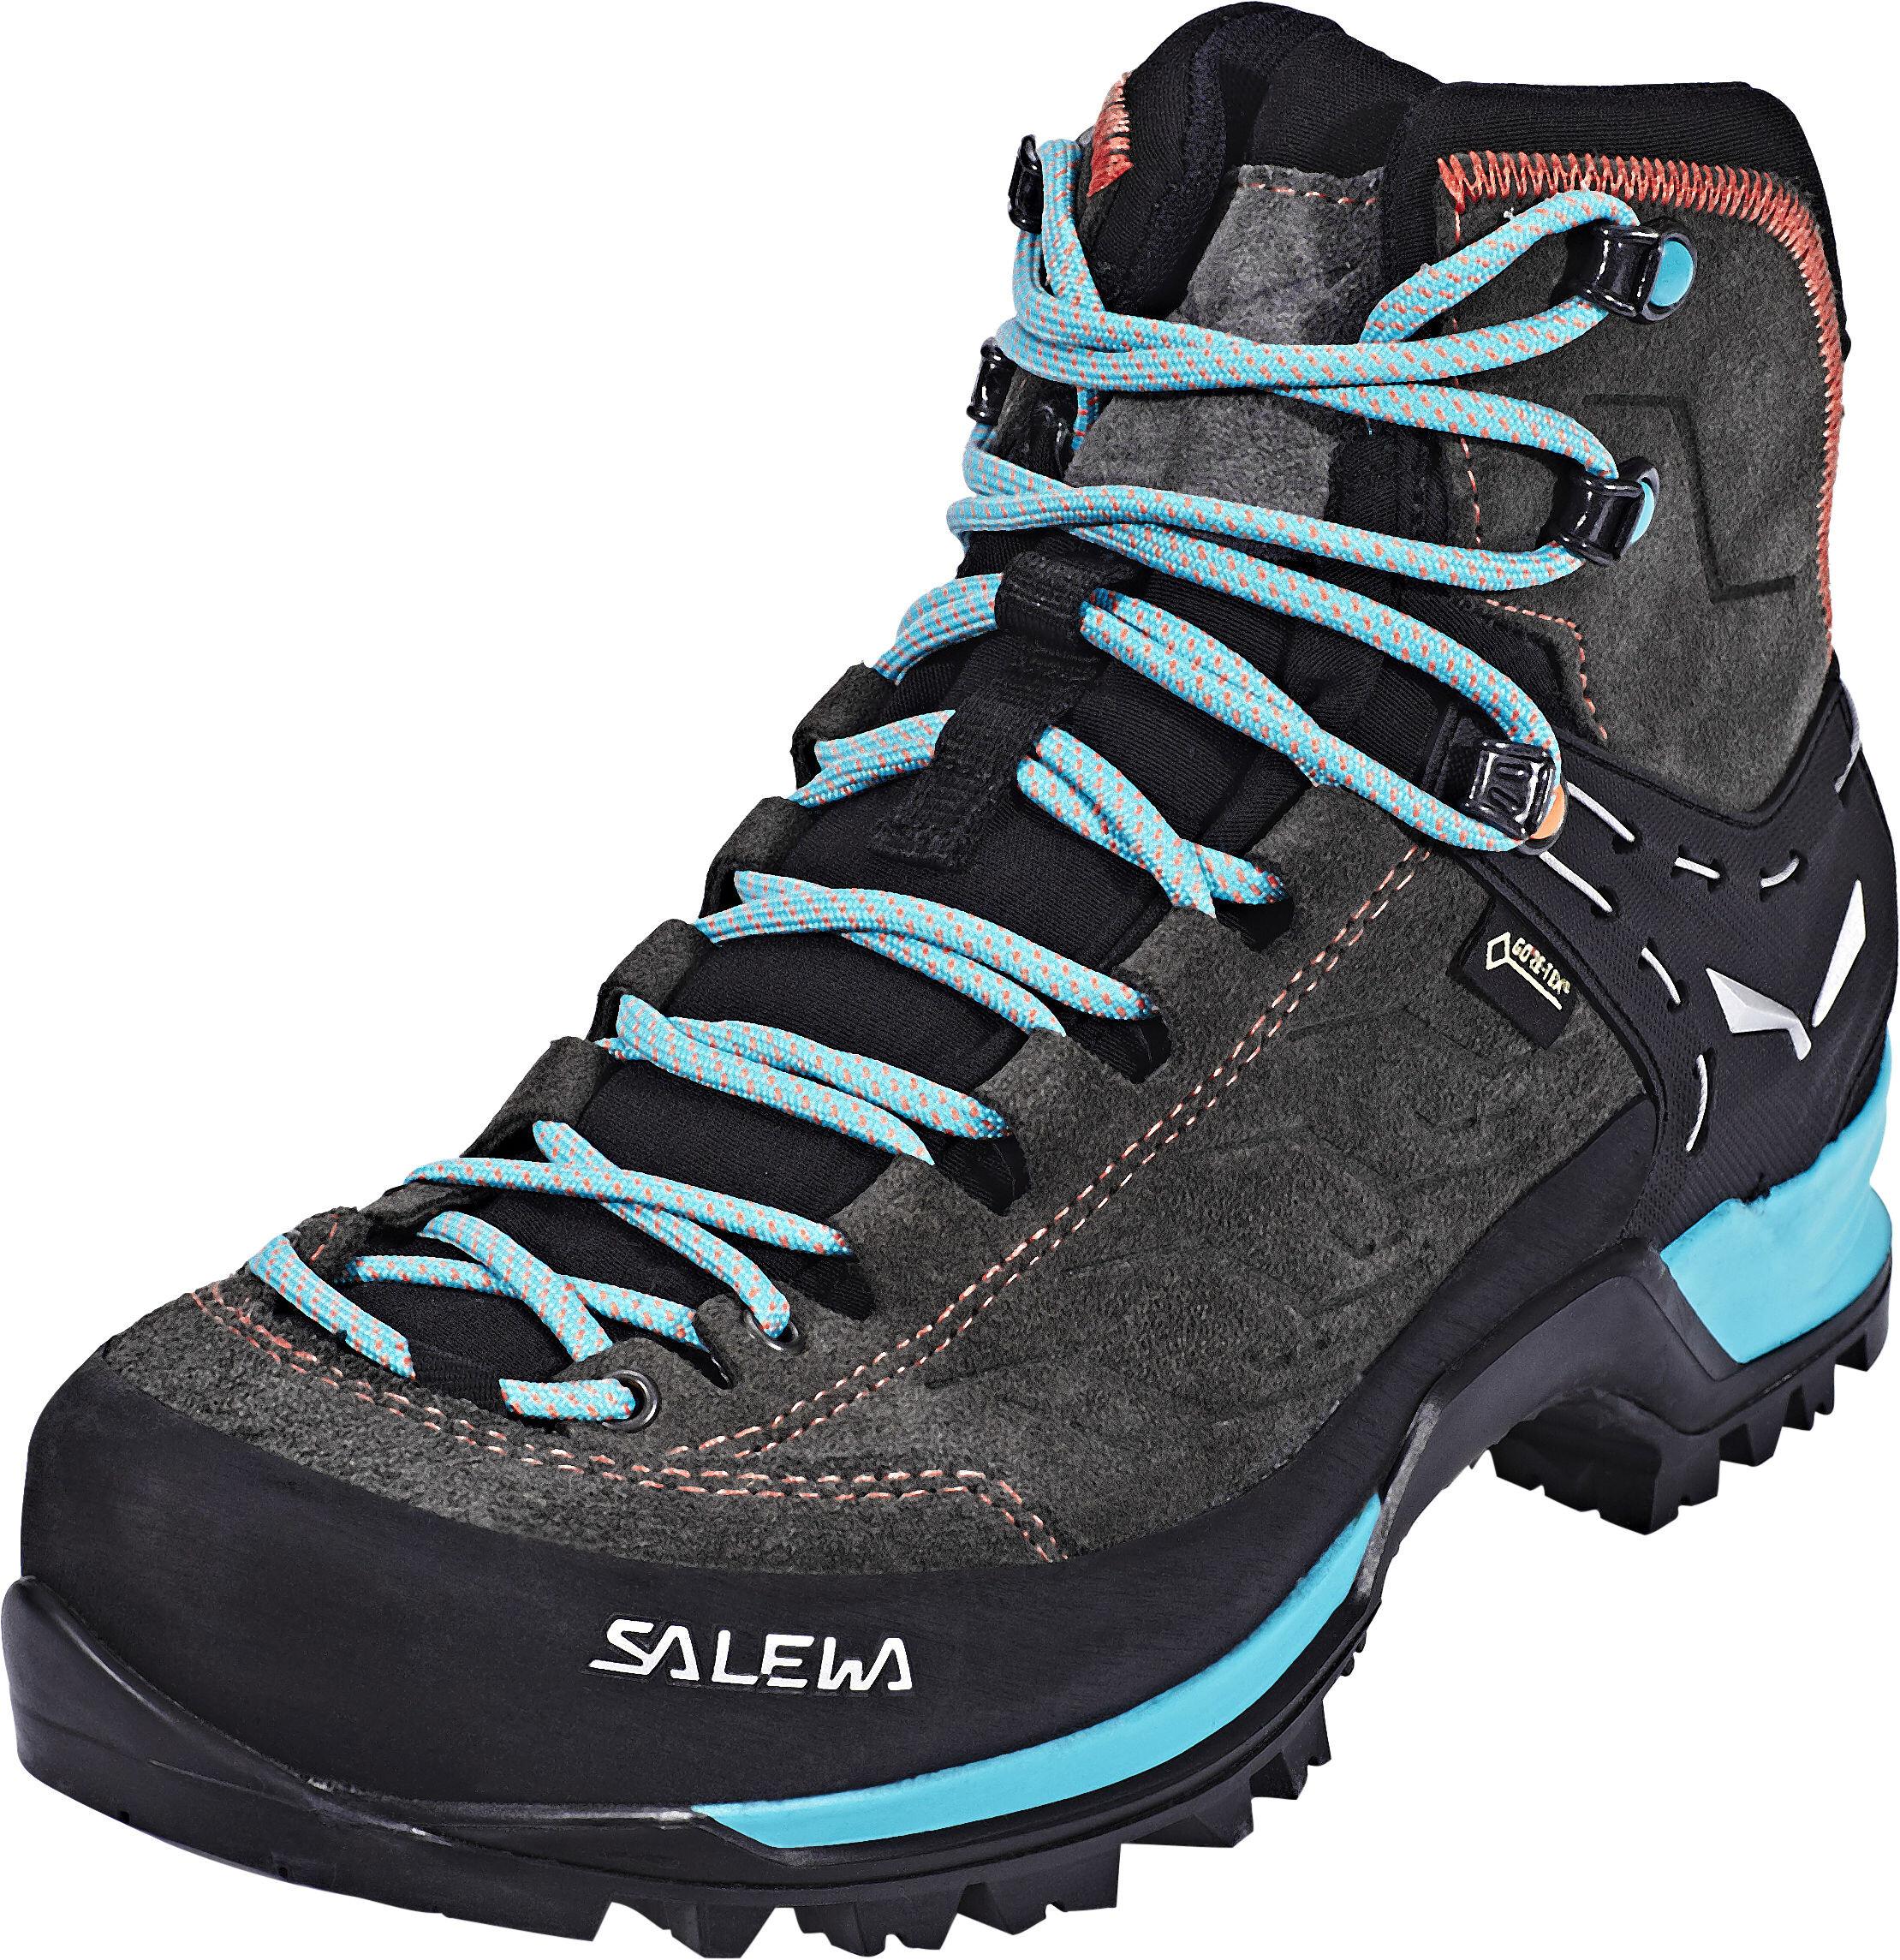 Salewa MTN Trainer Mid GTX Shoes Women Magnet Viridian Green  d507d963b